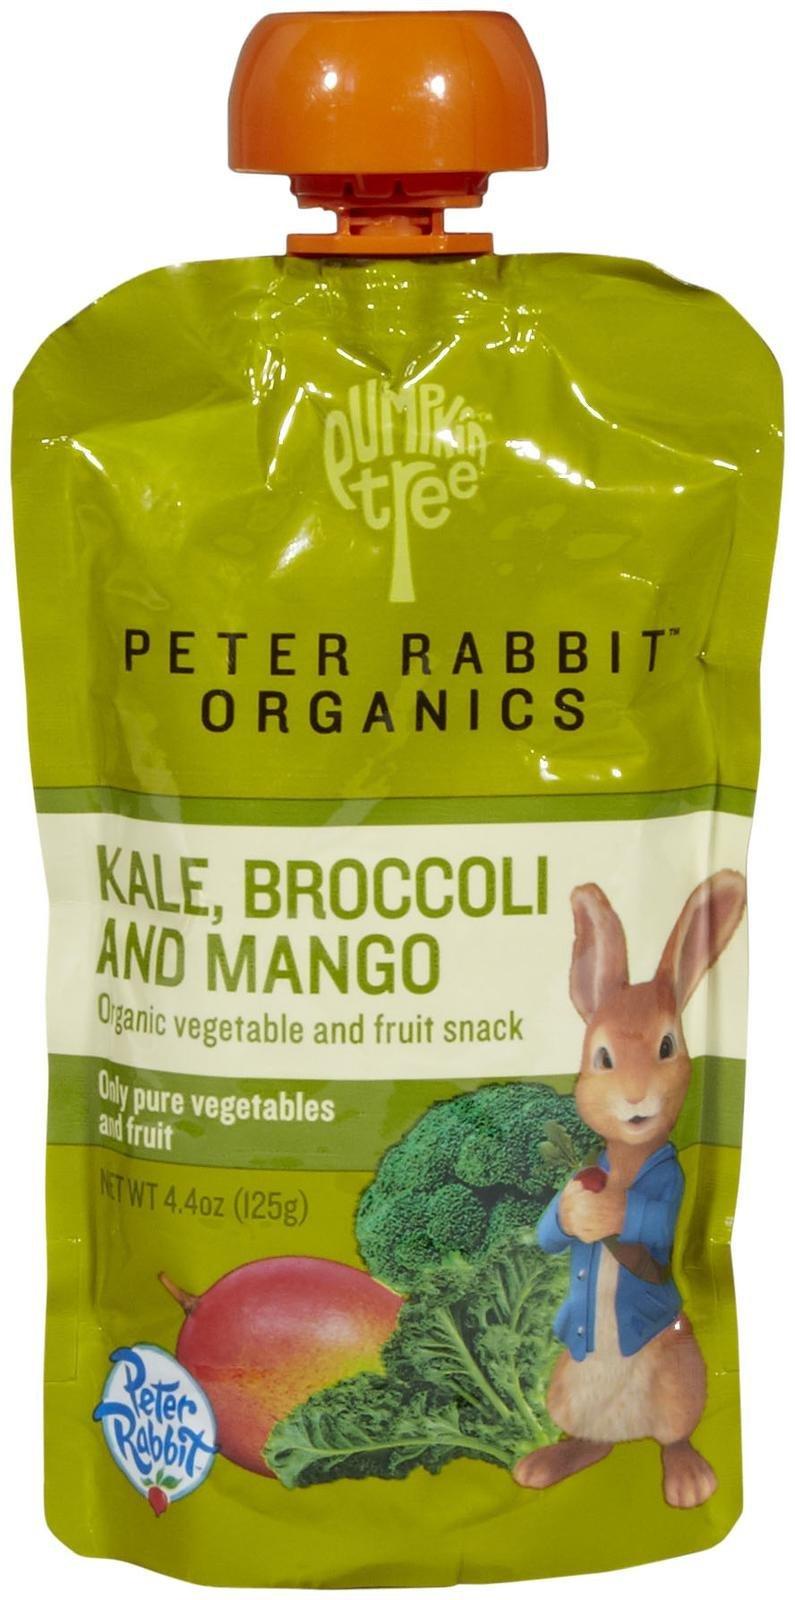 Peter Rabbit Organics - Organic Veg and Fruit Puree 100% Kale, Broccoli and Mango - 4.4 oz. pack of 3 by Peter Rabbit Organics